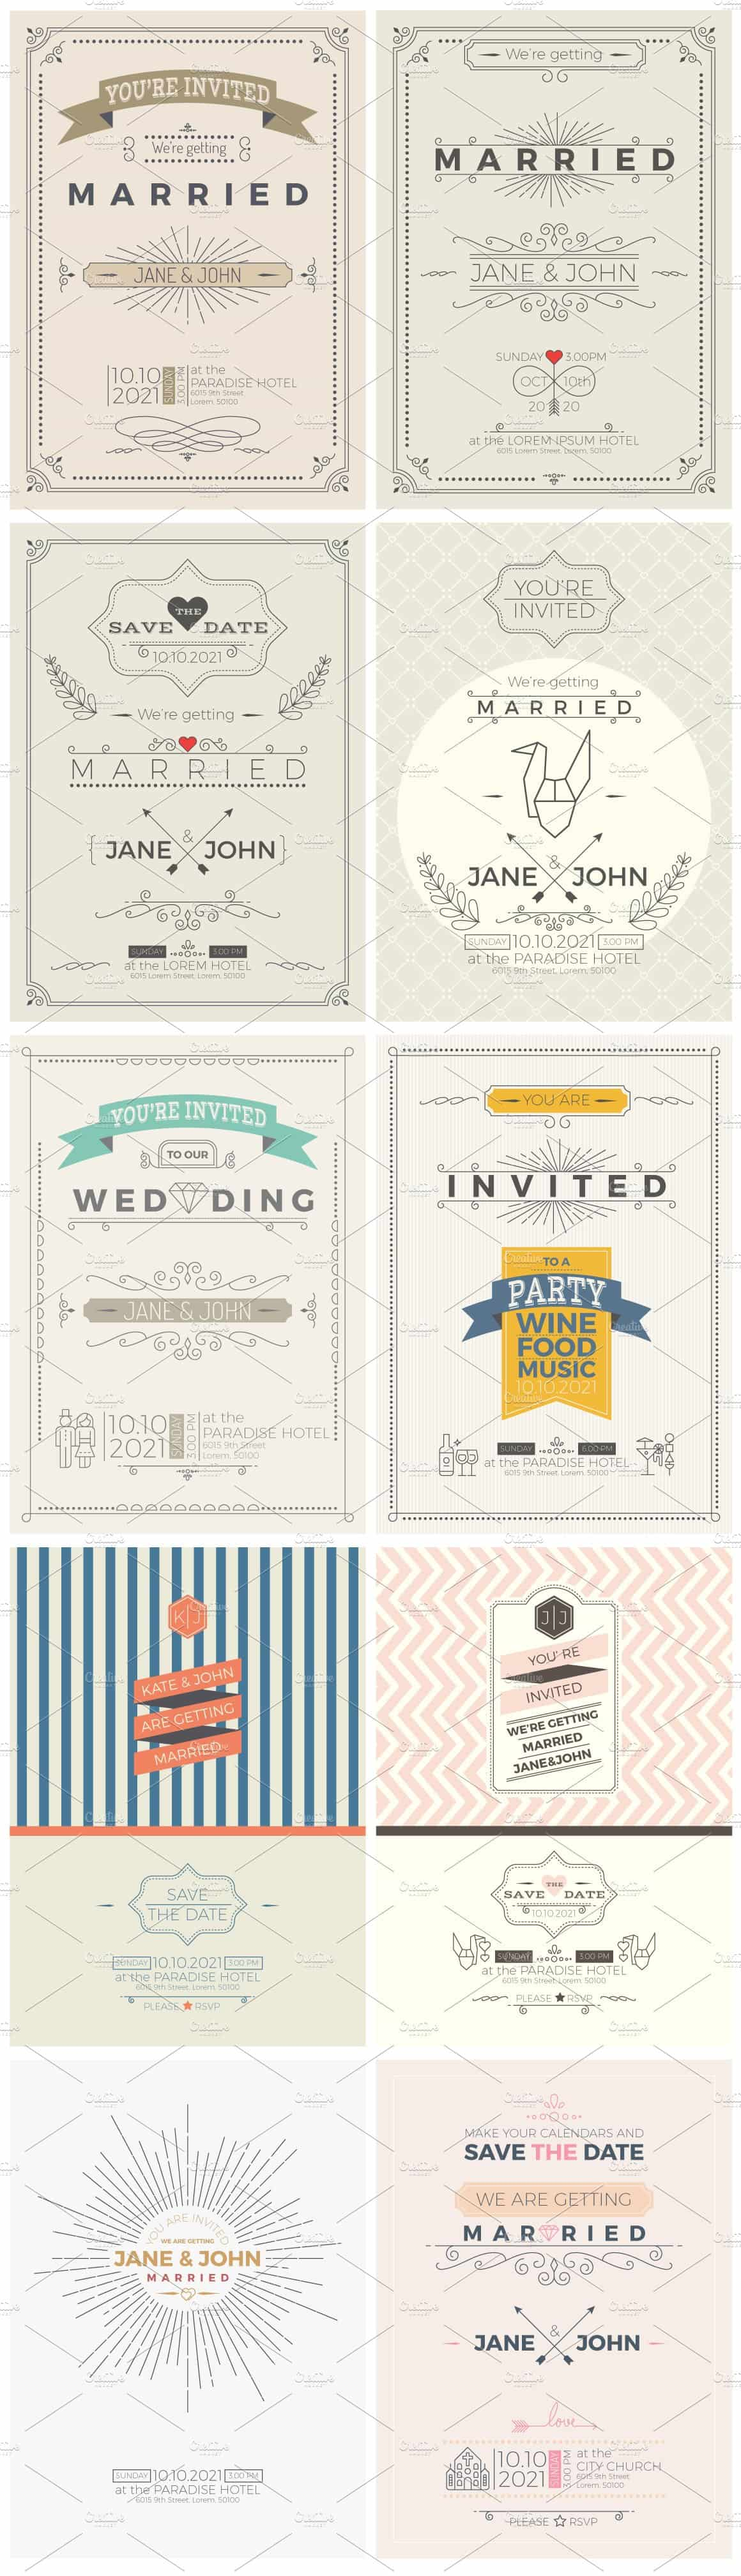 Wedding Invitations Value Pack